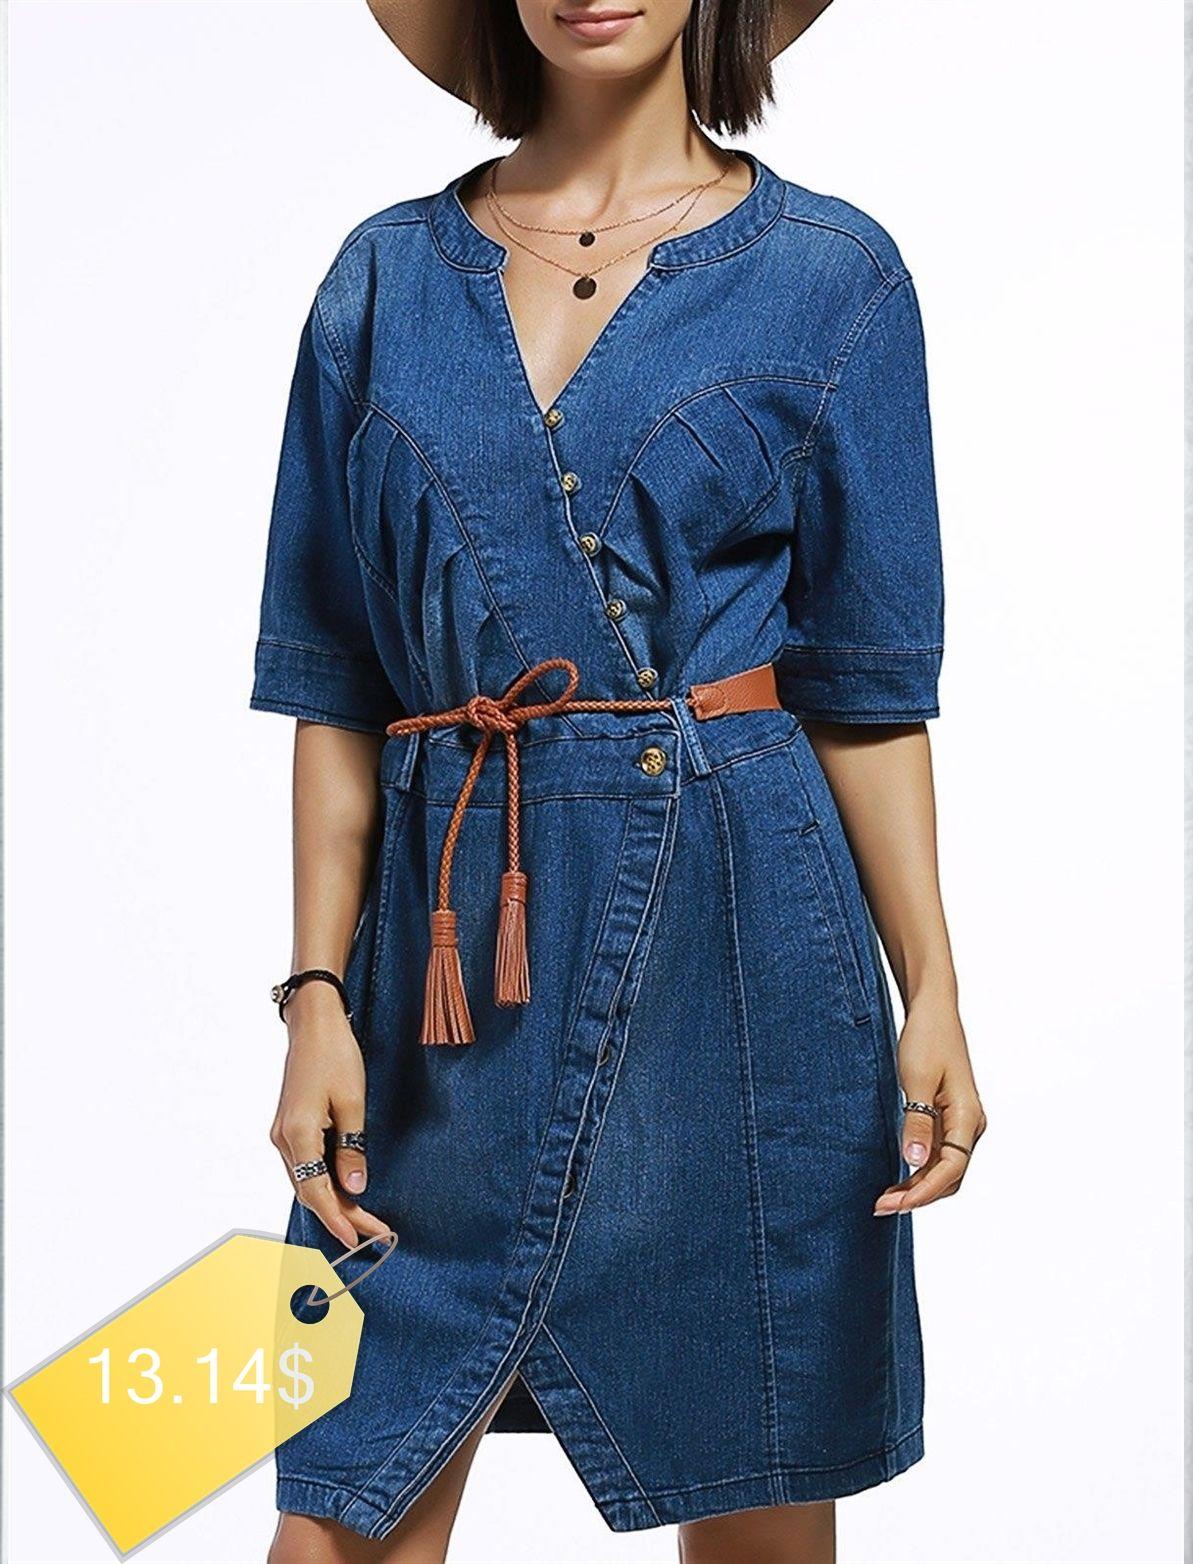 Chic Buttoned Pocket Design Slit Denim Dress For Women